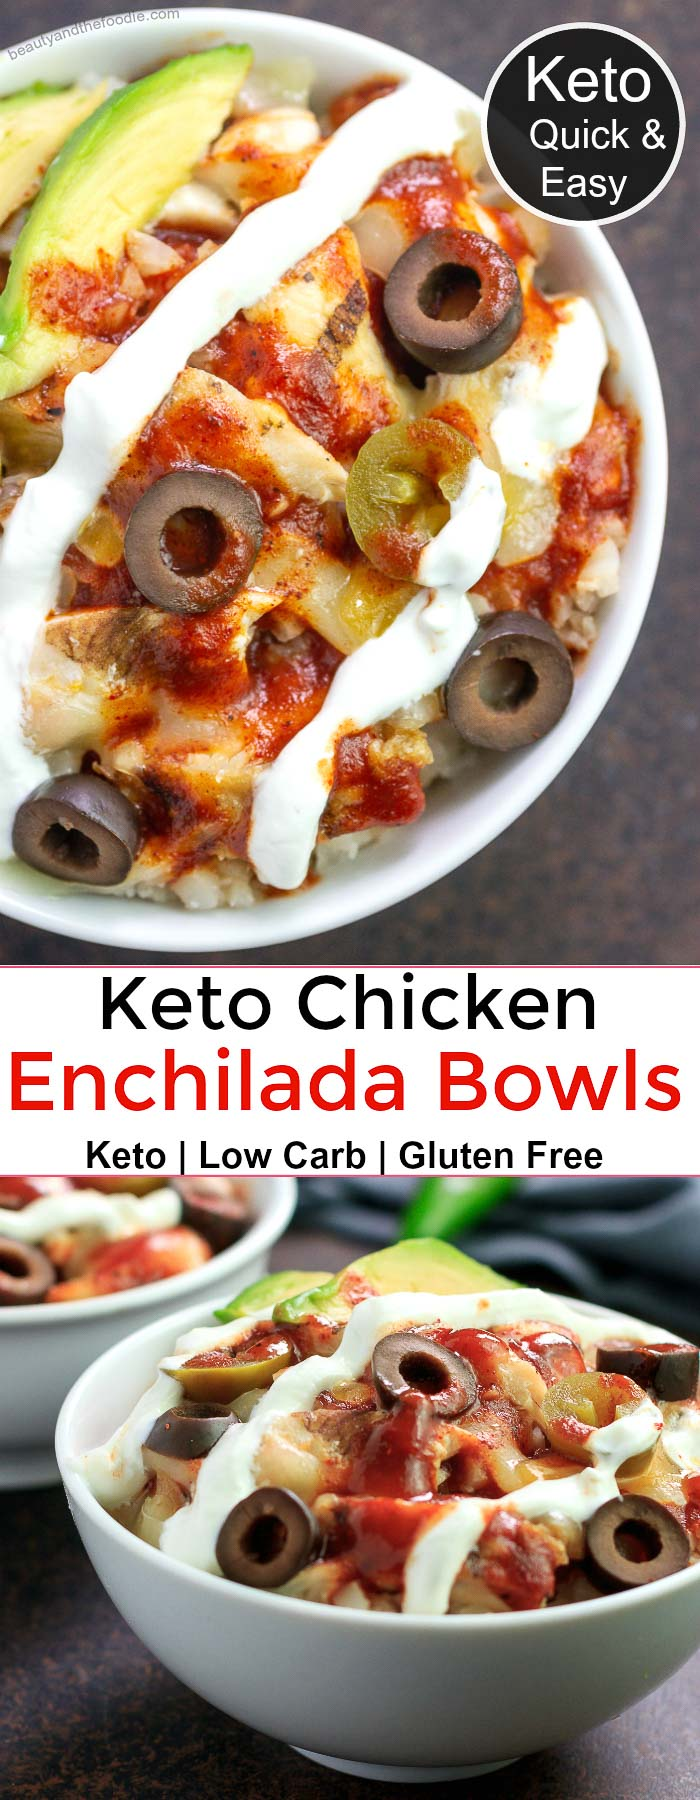 Keto Chicken Enchilada Bowls- low carb & gluten free